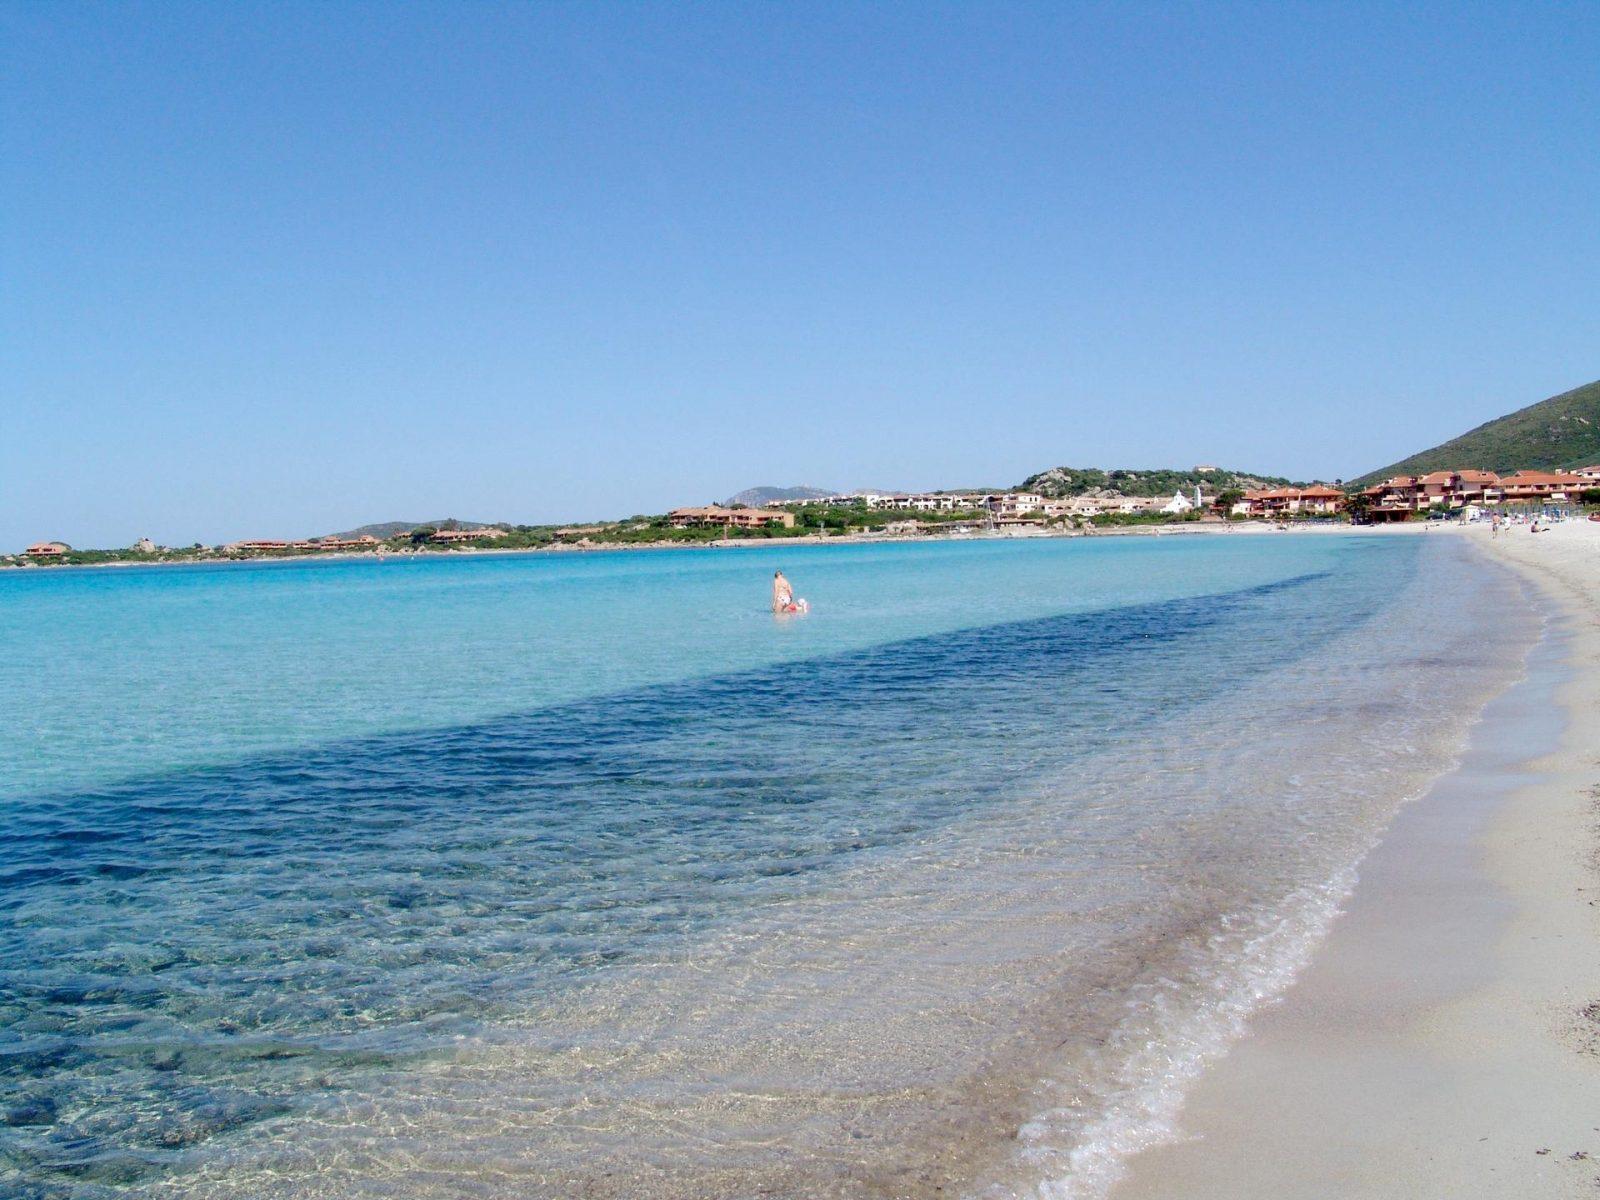 Cartina Sardegna Golfo Di Marinella.Spiaggia Di Marinella Sardegna Spiagge Italiane Su Trovaspiagge It